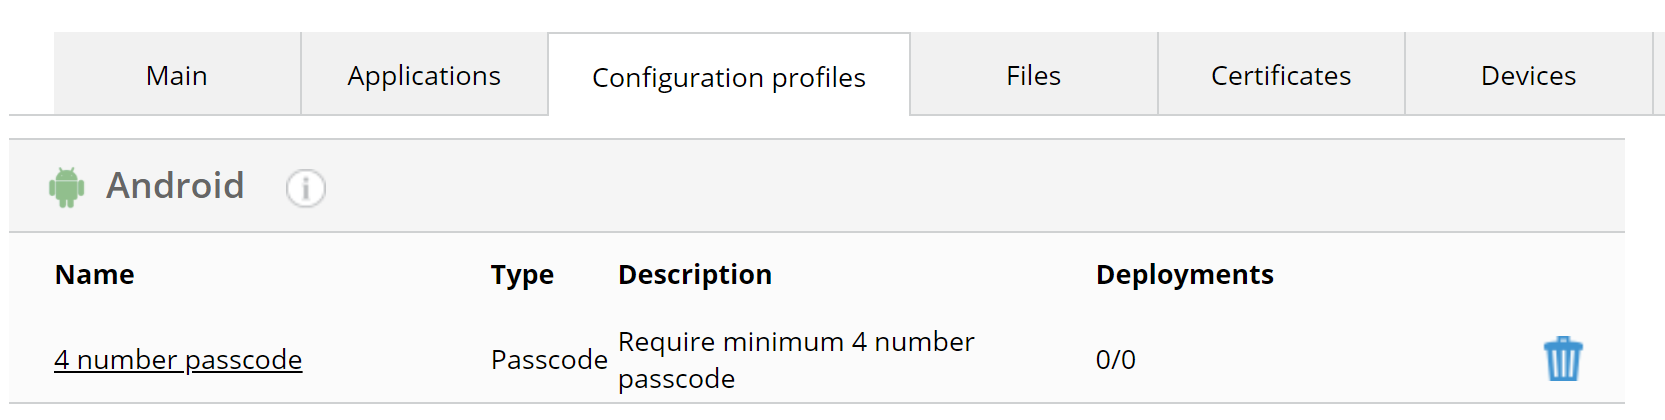 Configuration profiles tab